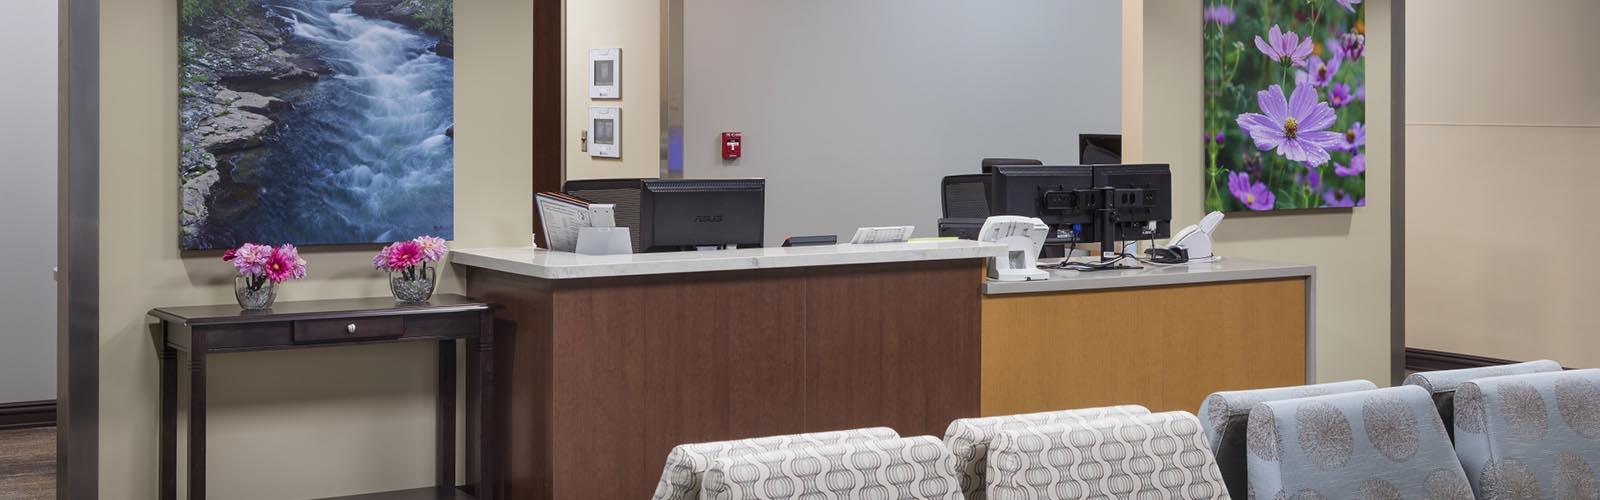 Golden Valley Memorial Hospital - Outpatient Expansion 4